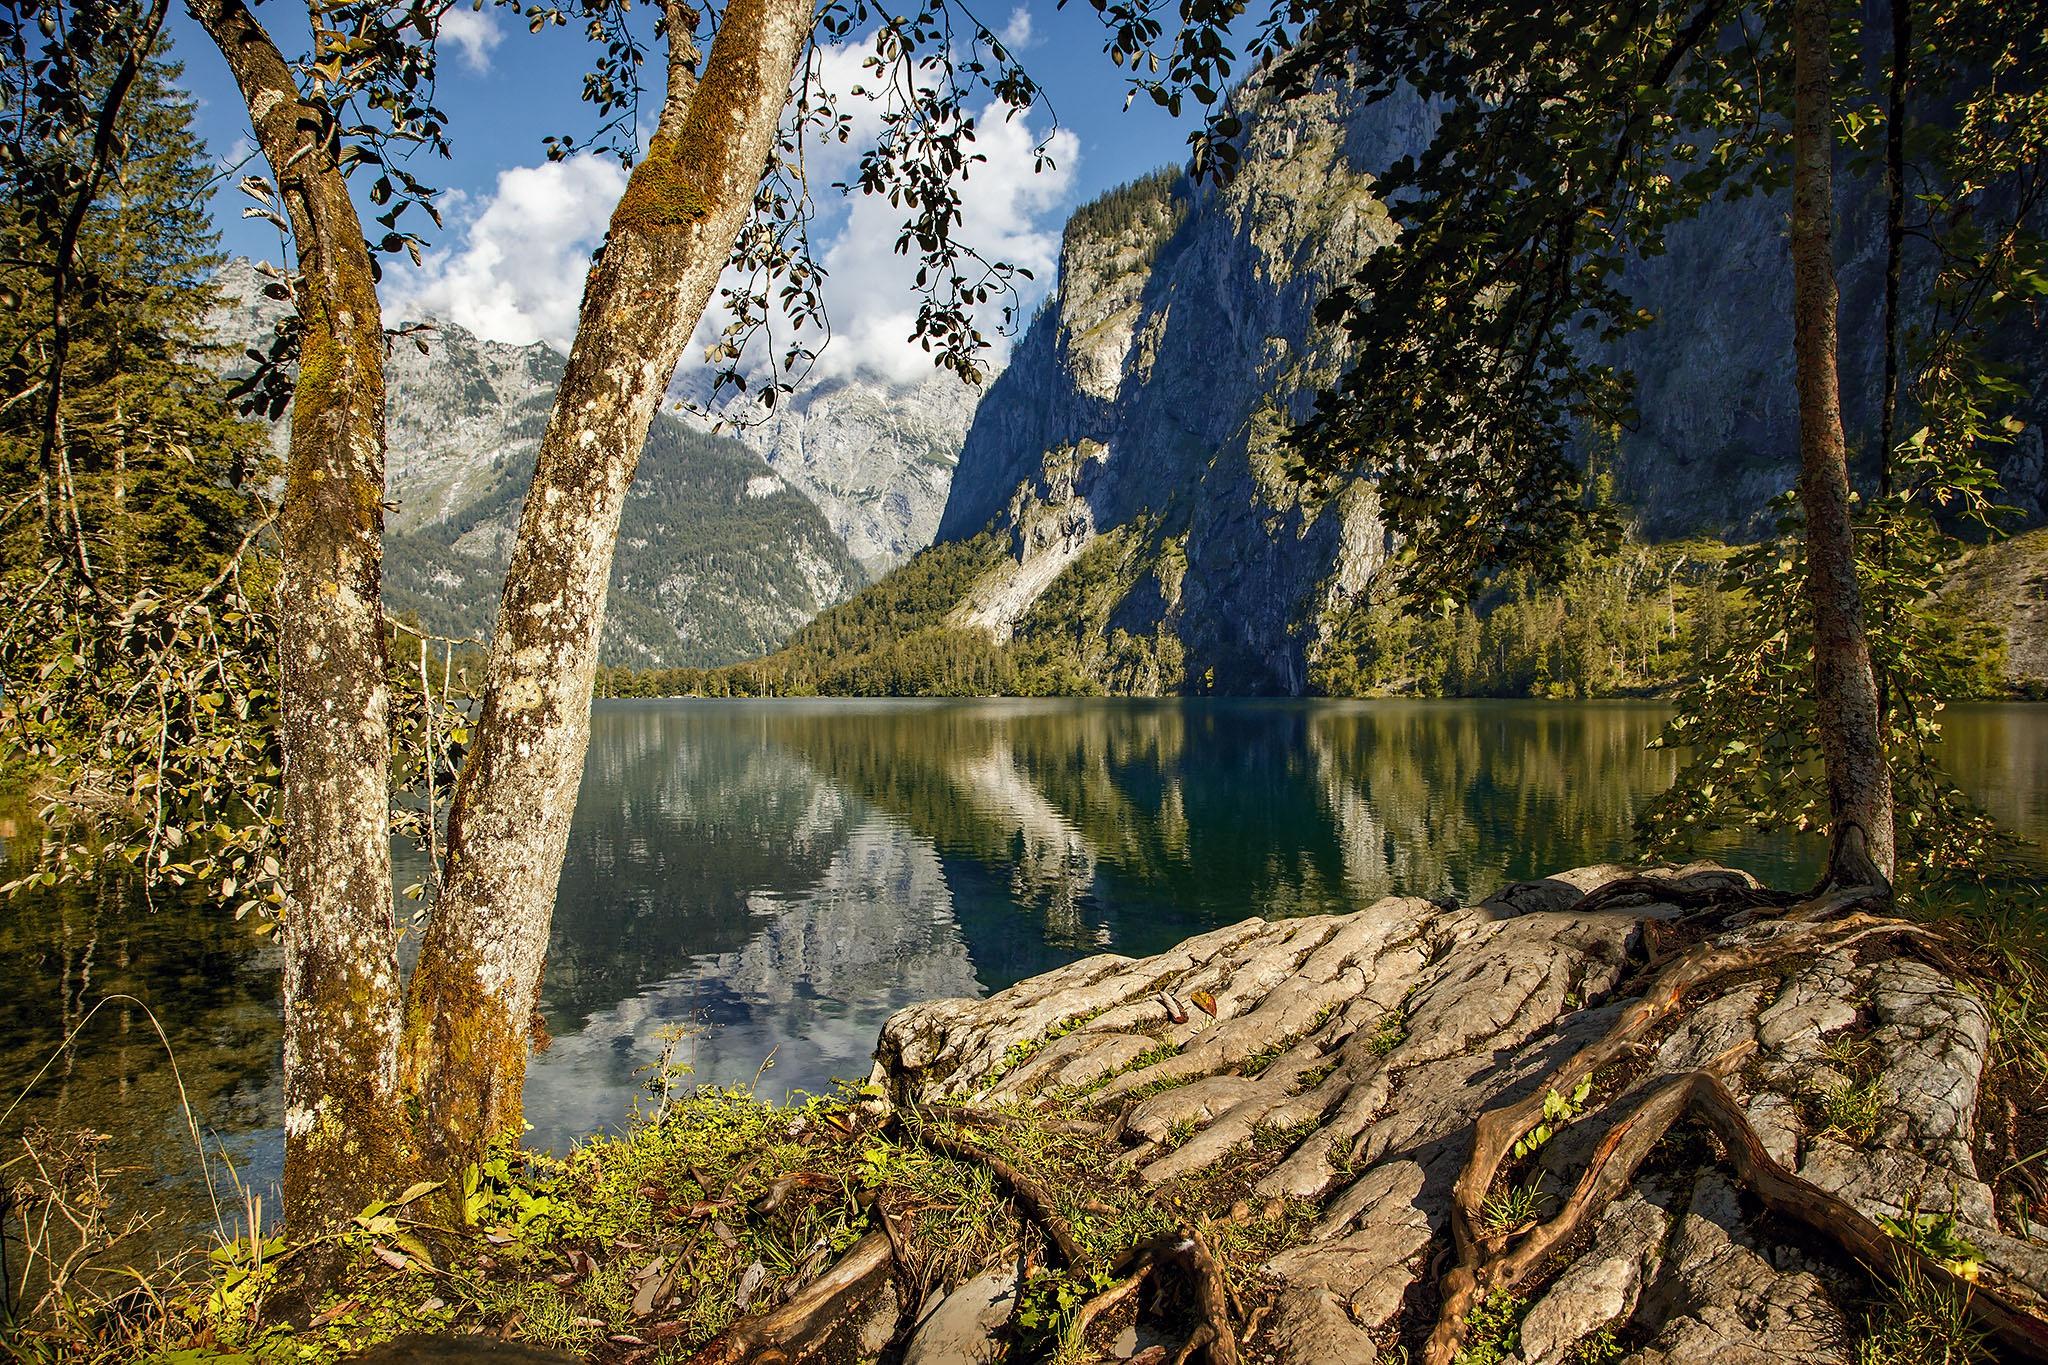 Germany Cloud Tree Mountain Lake Reflection 2048x1365